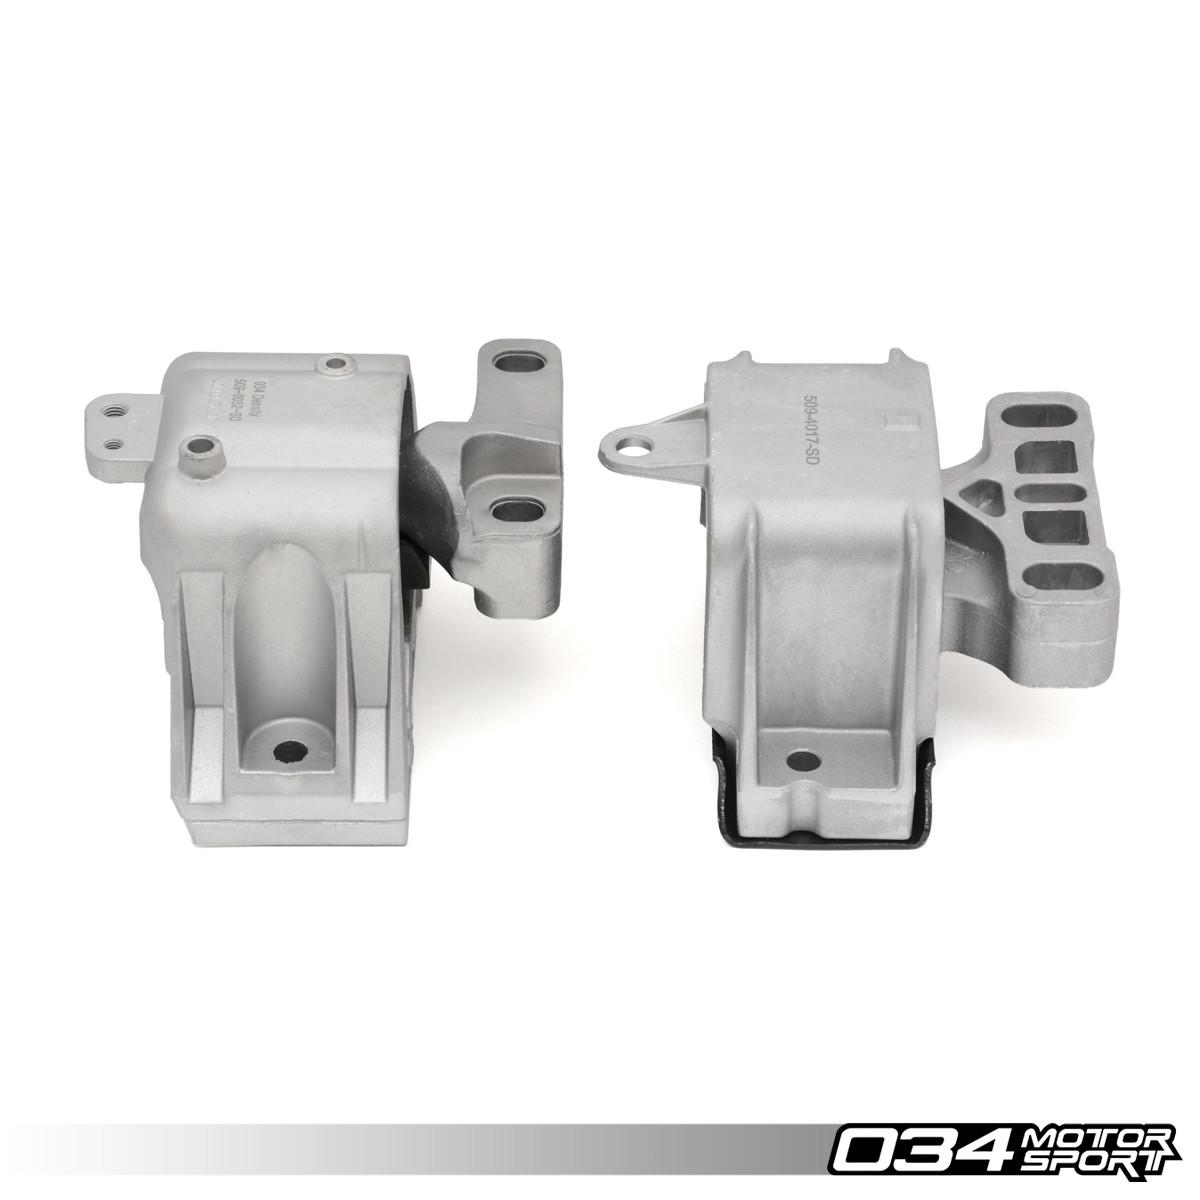 hight resolution of motor mount pair density line mkiv volkswagen 8l 8n audi 1 8